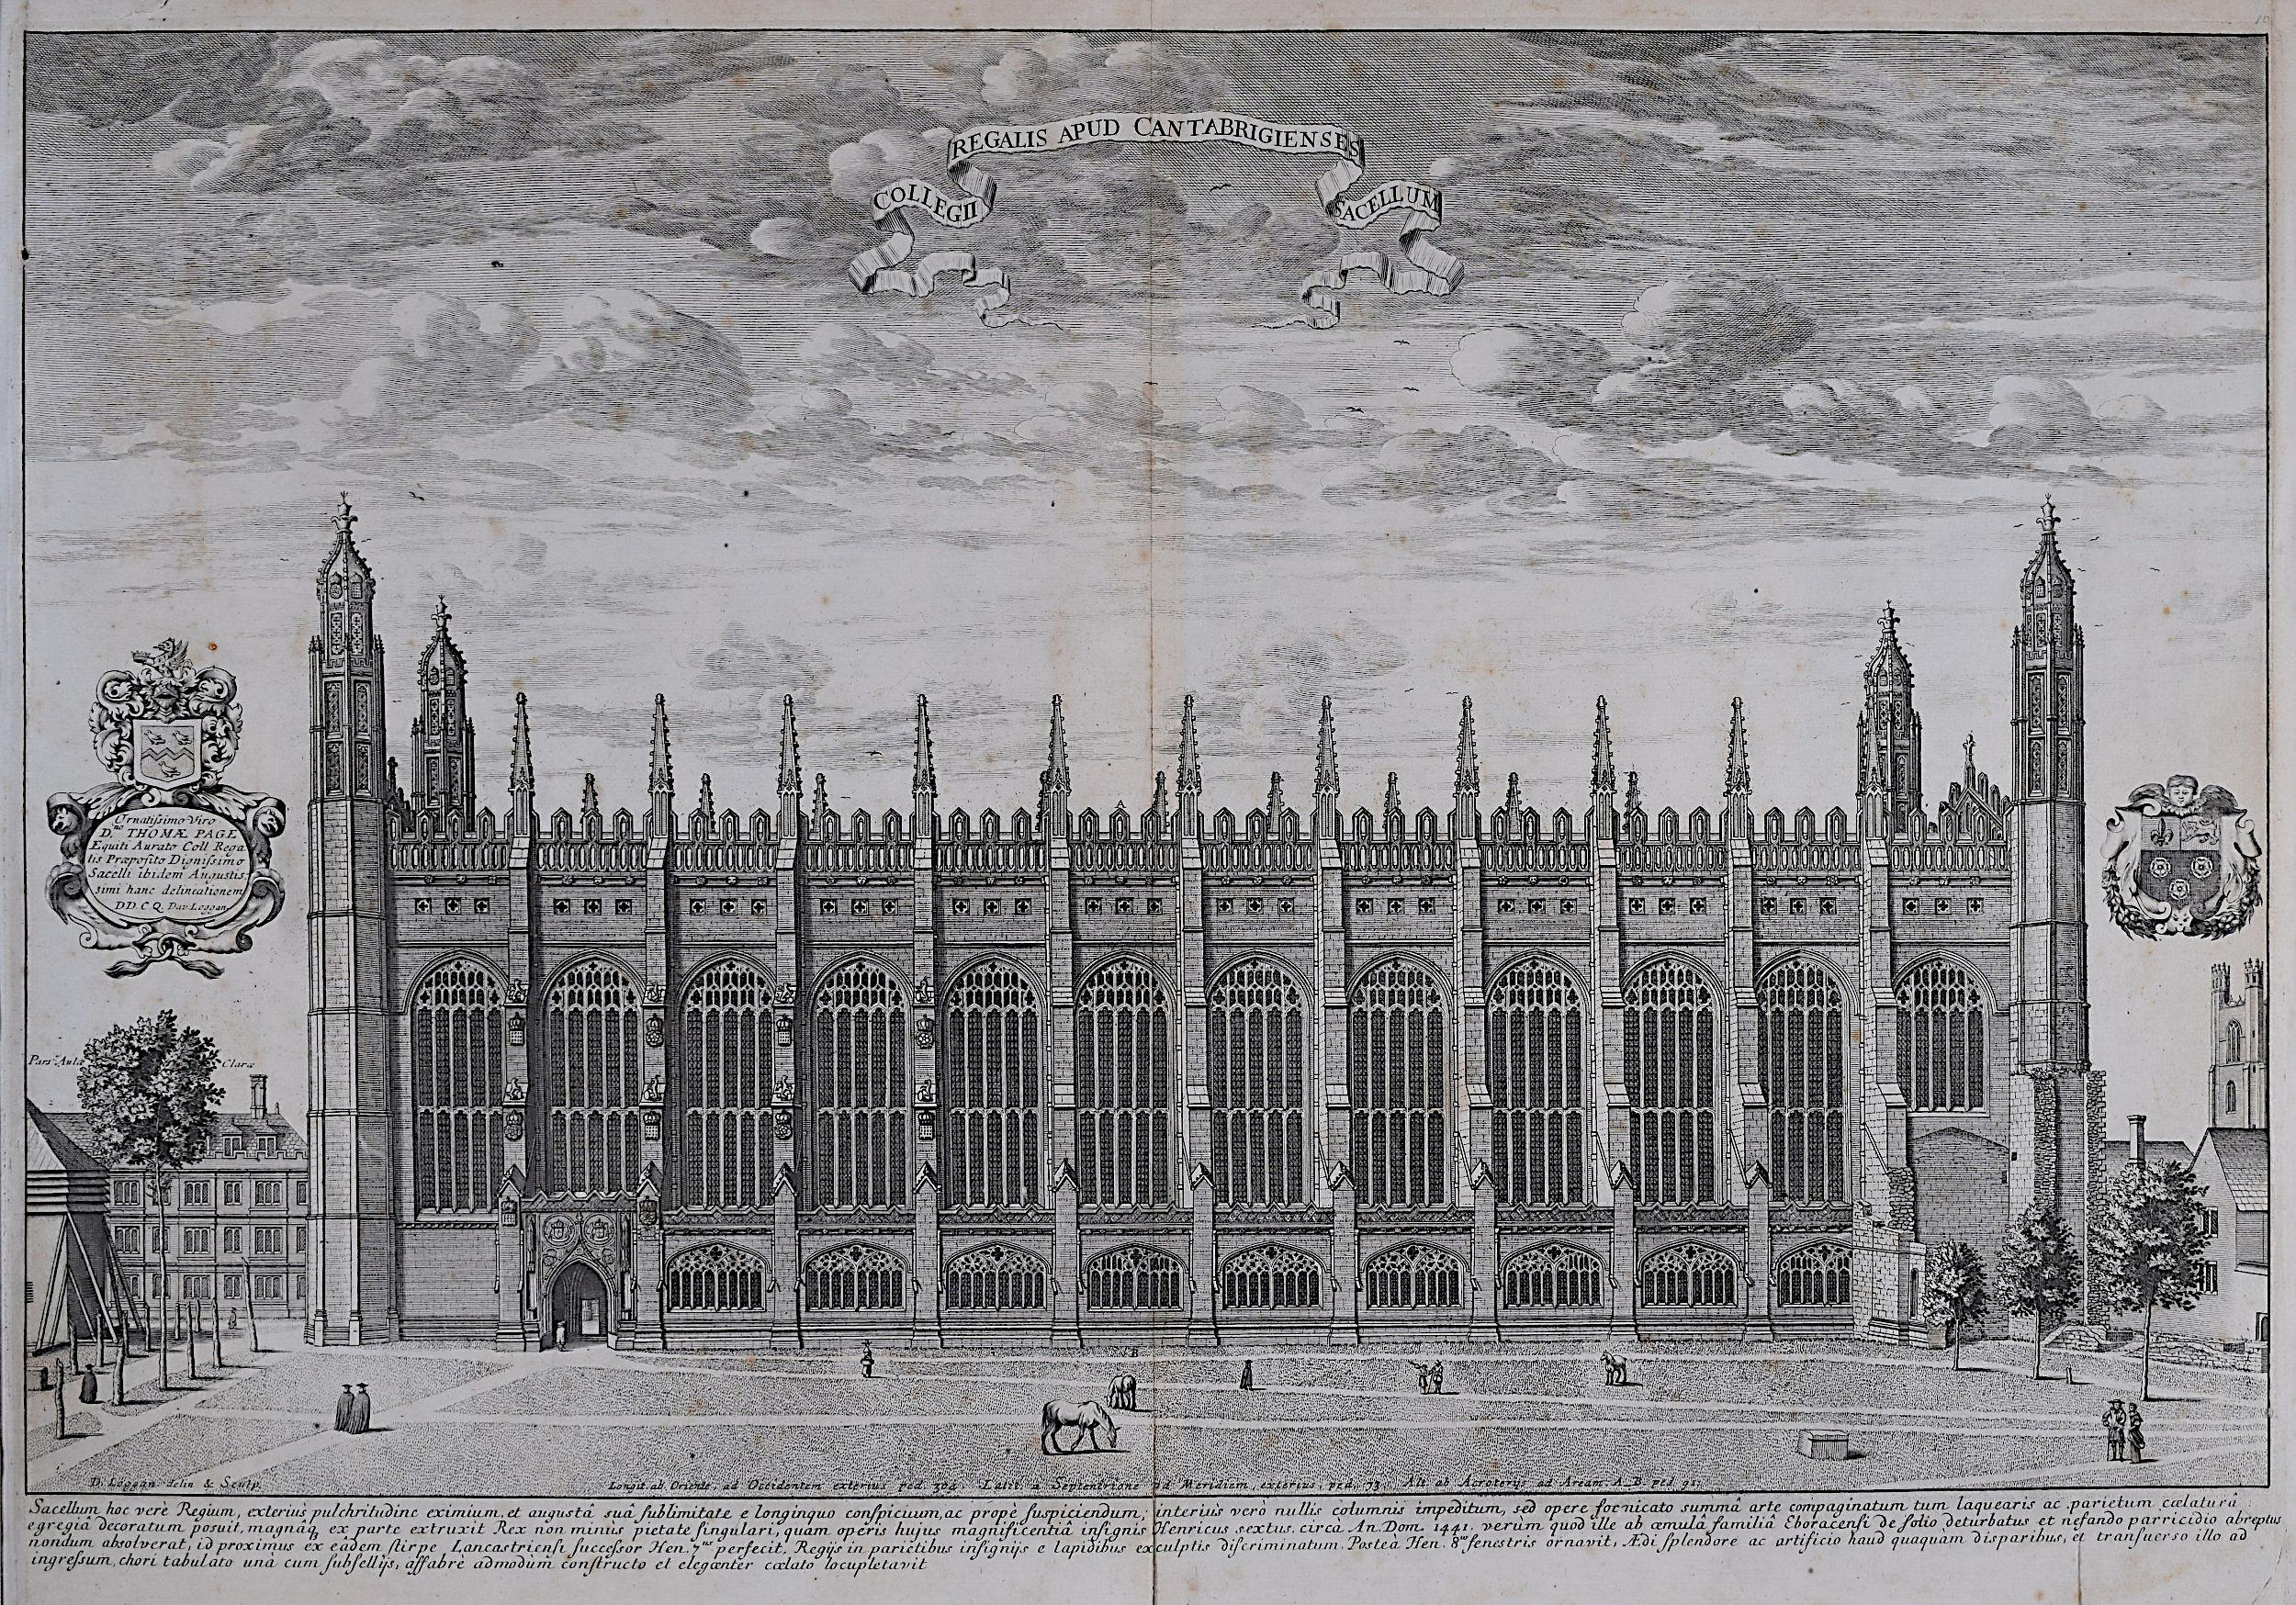 David Loggan King's College Cambridge Chapel South Front engraving 1690